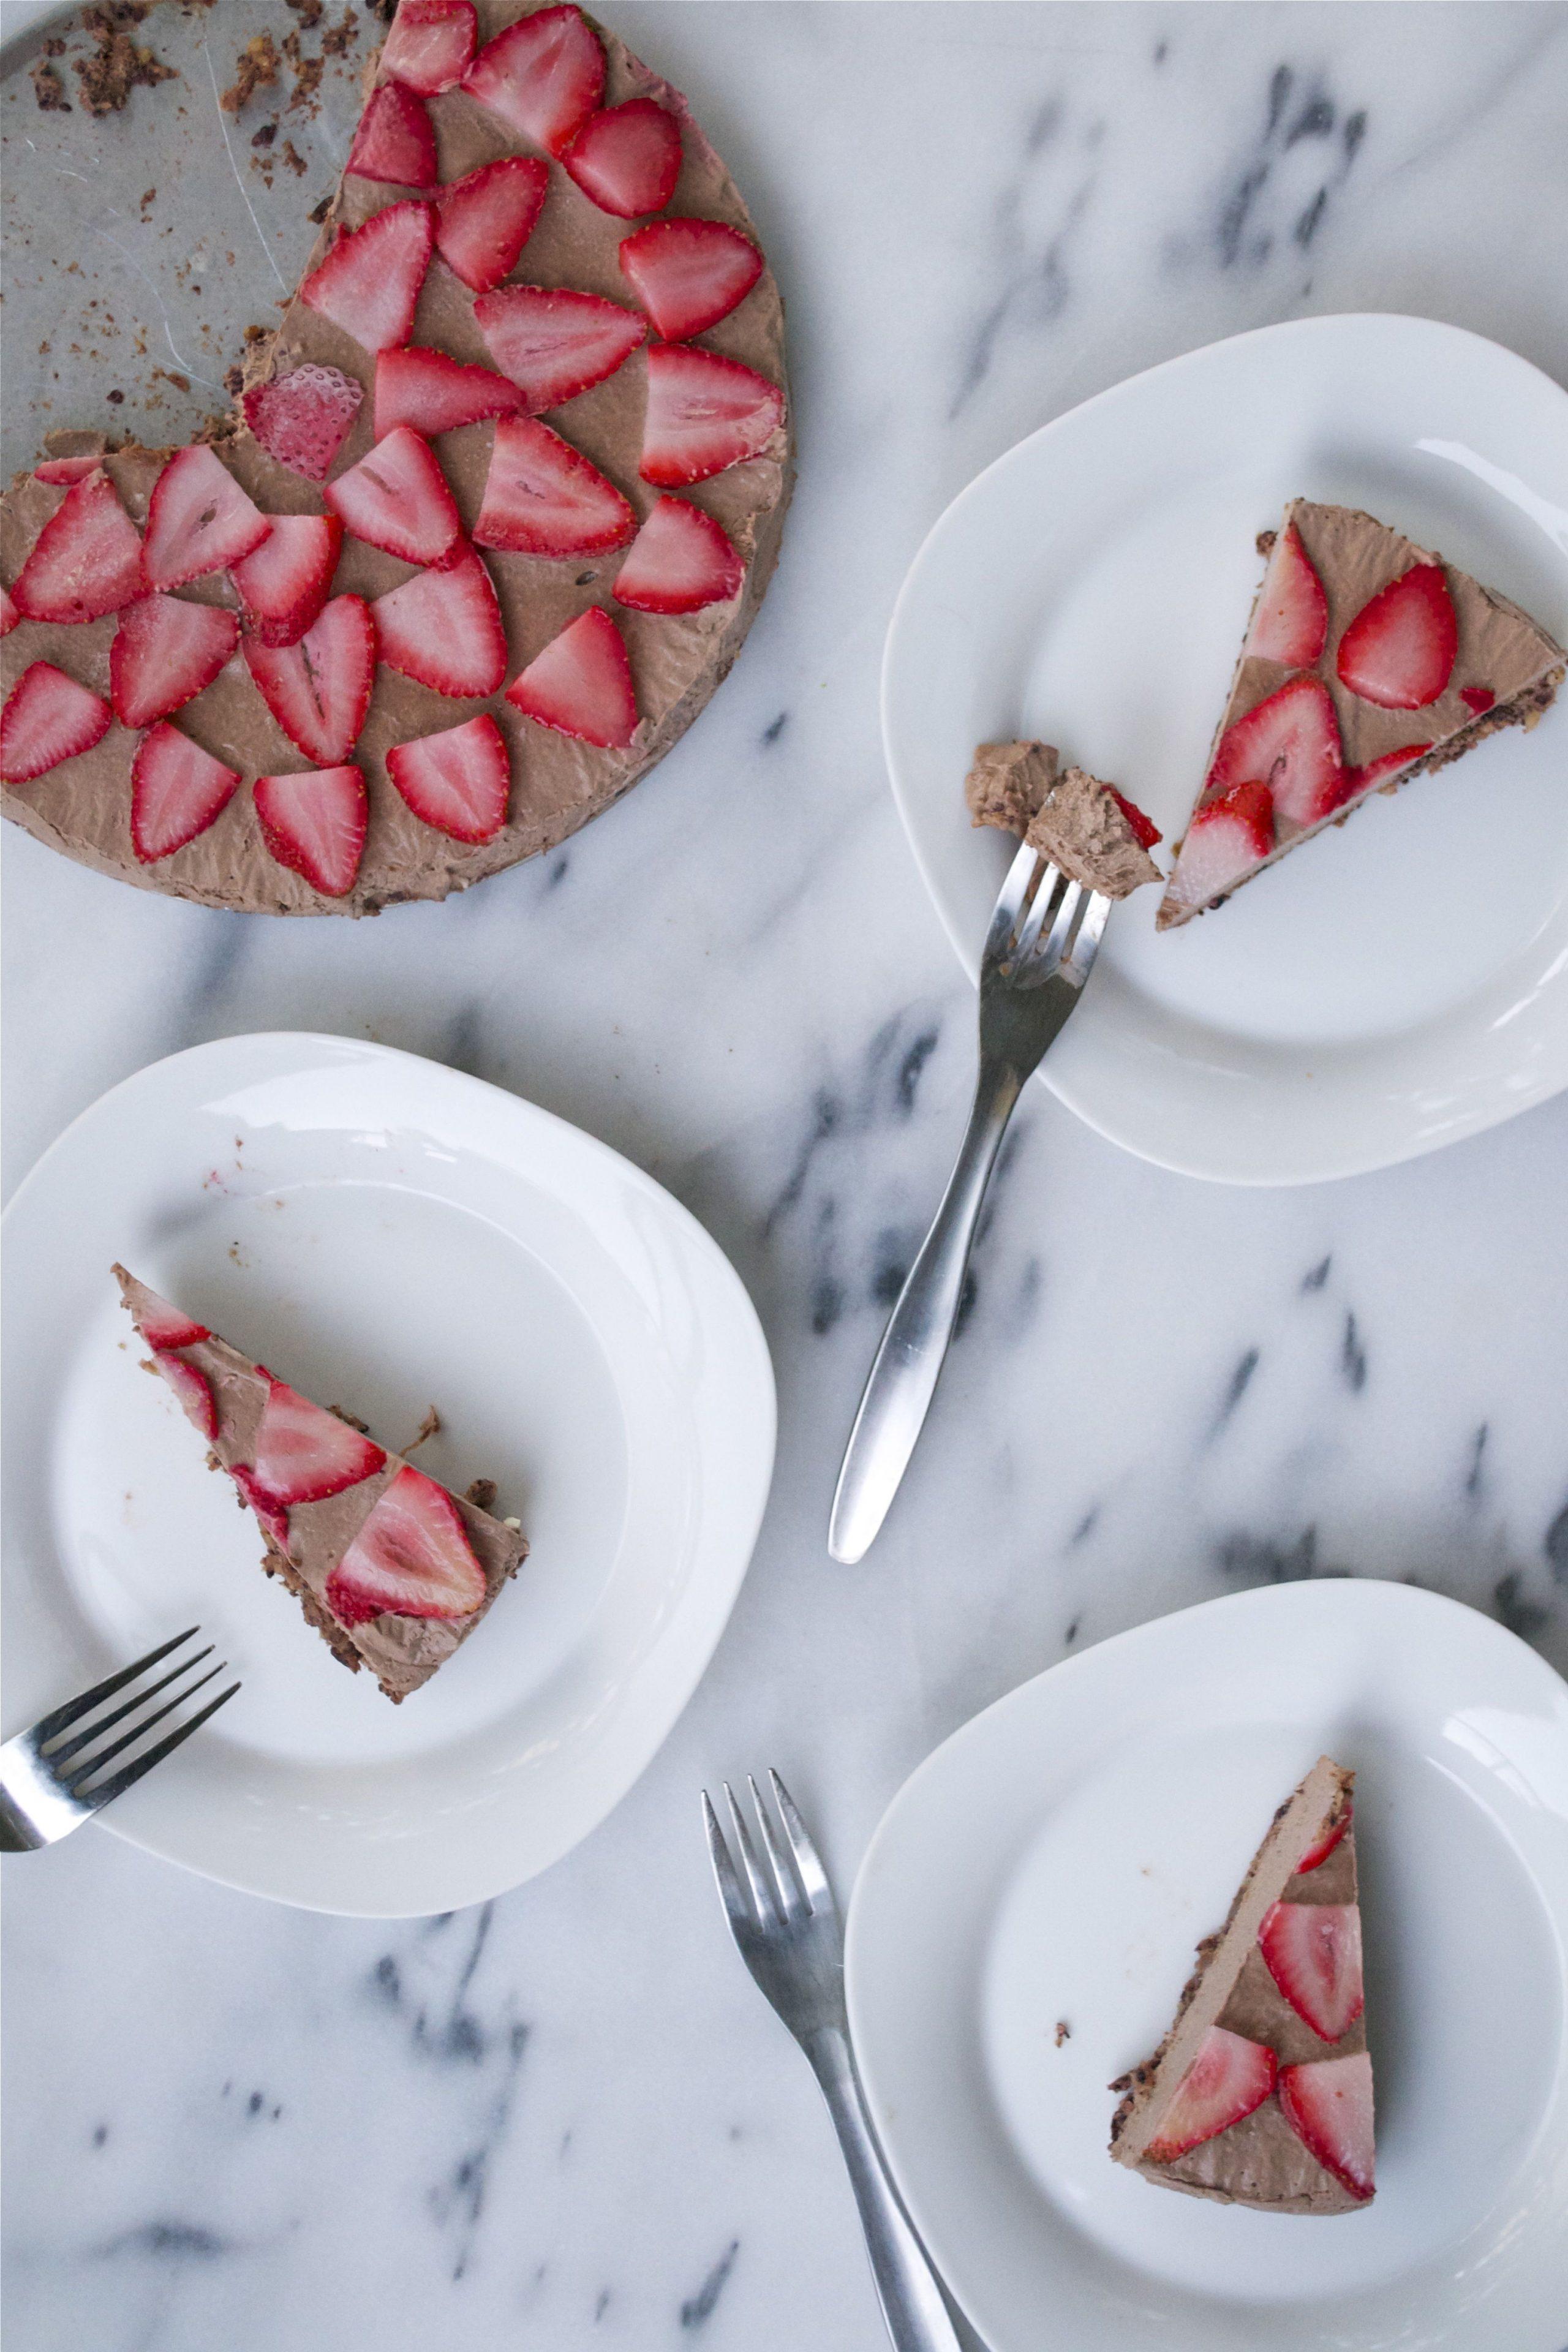 Vegan Chocolate Strawberry Cheesecake (GF, DF, V, RSF) - A Dash of Megnut